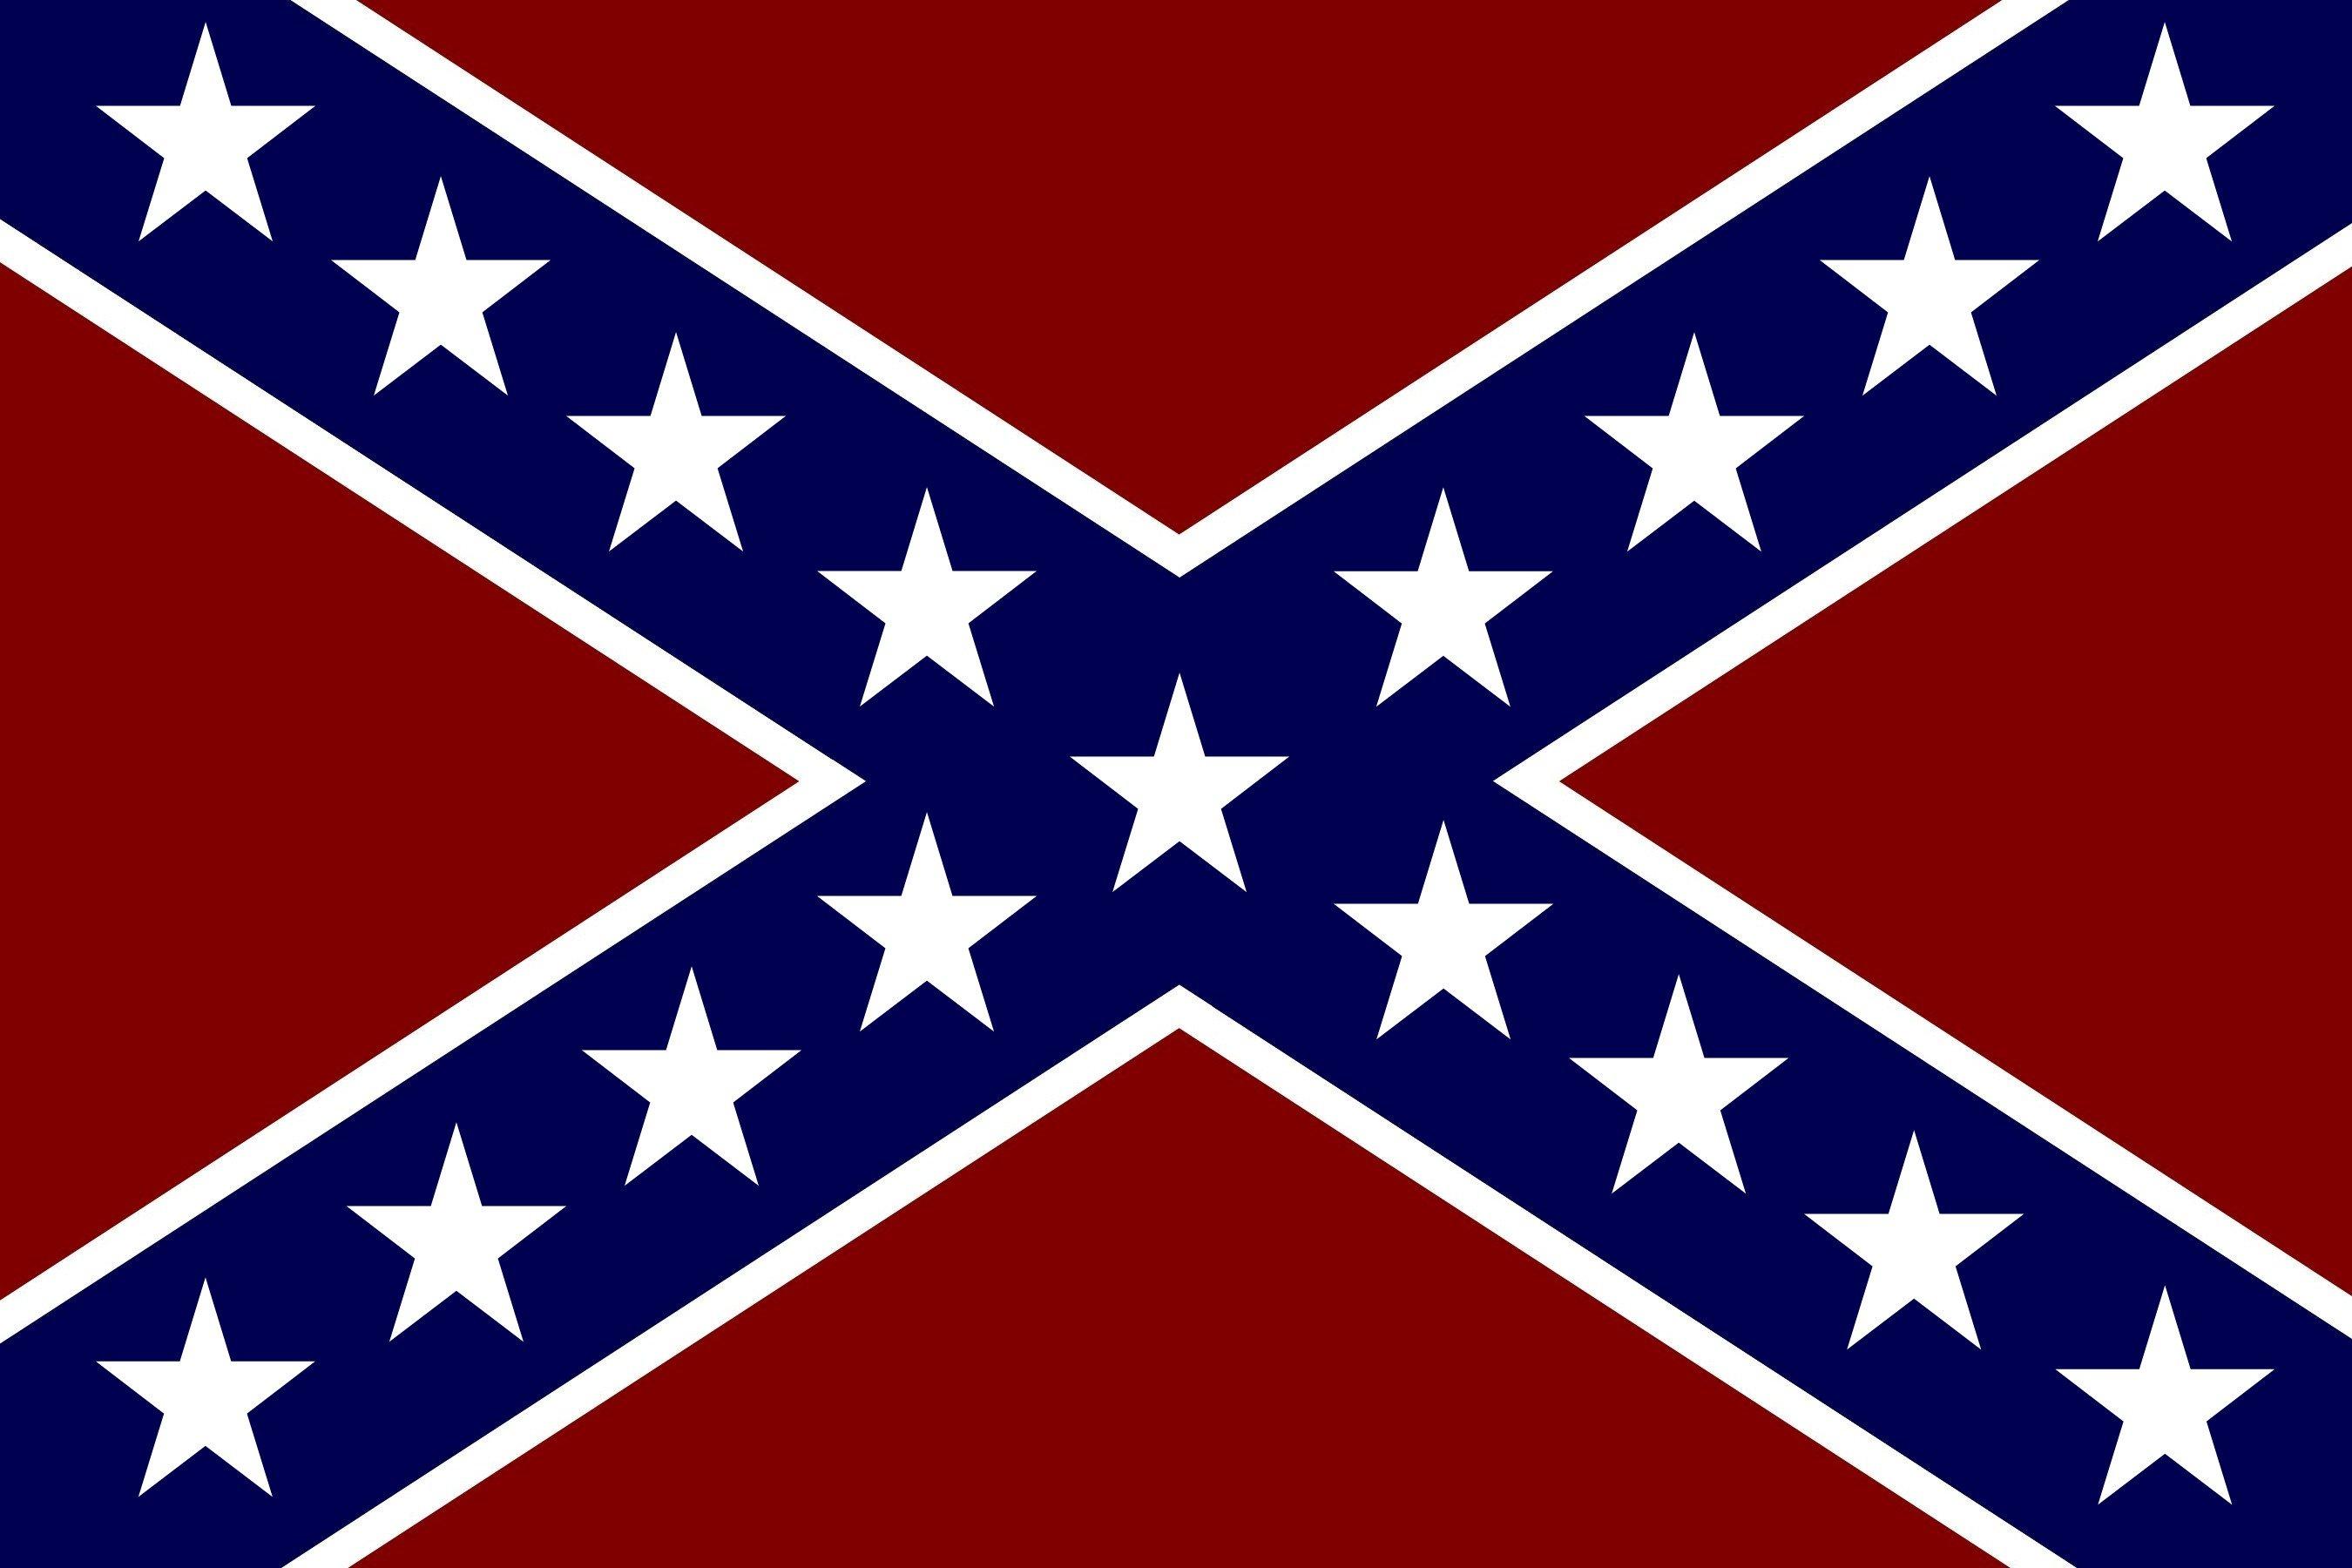 Free download CONFEDERATE flag usa america united states ...